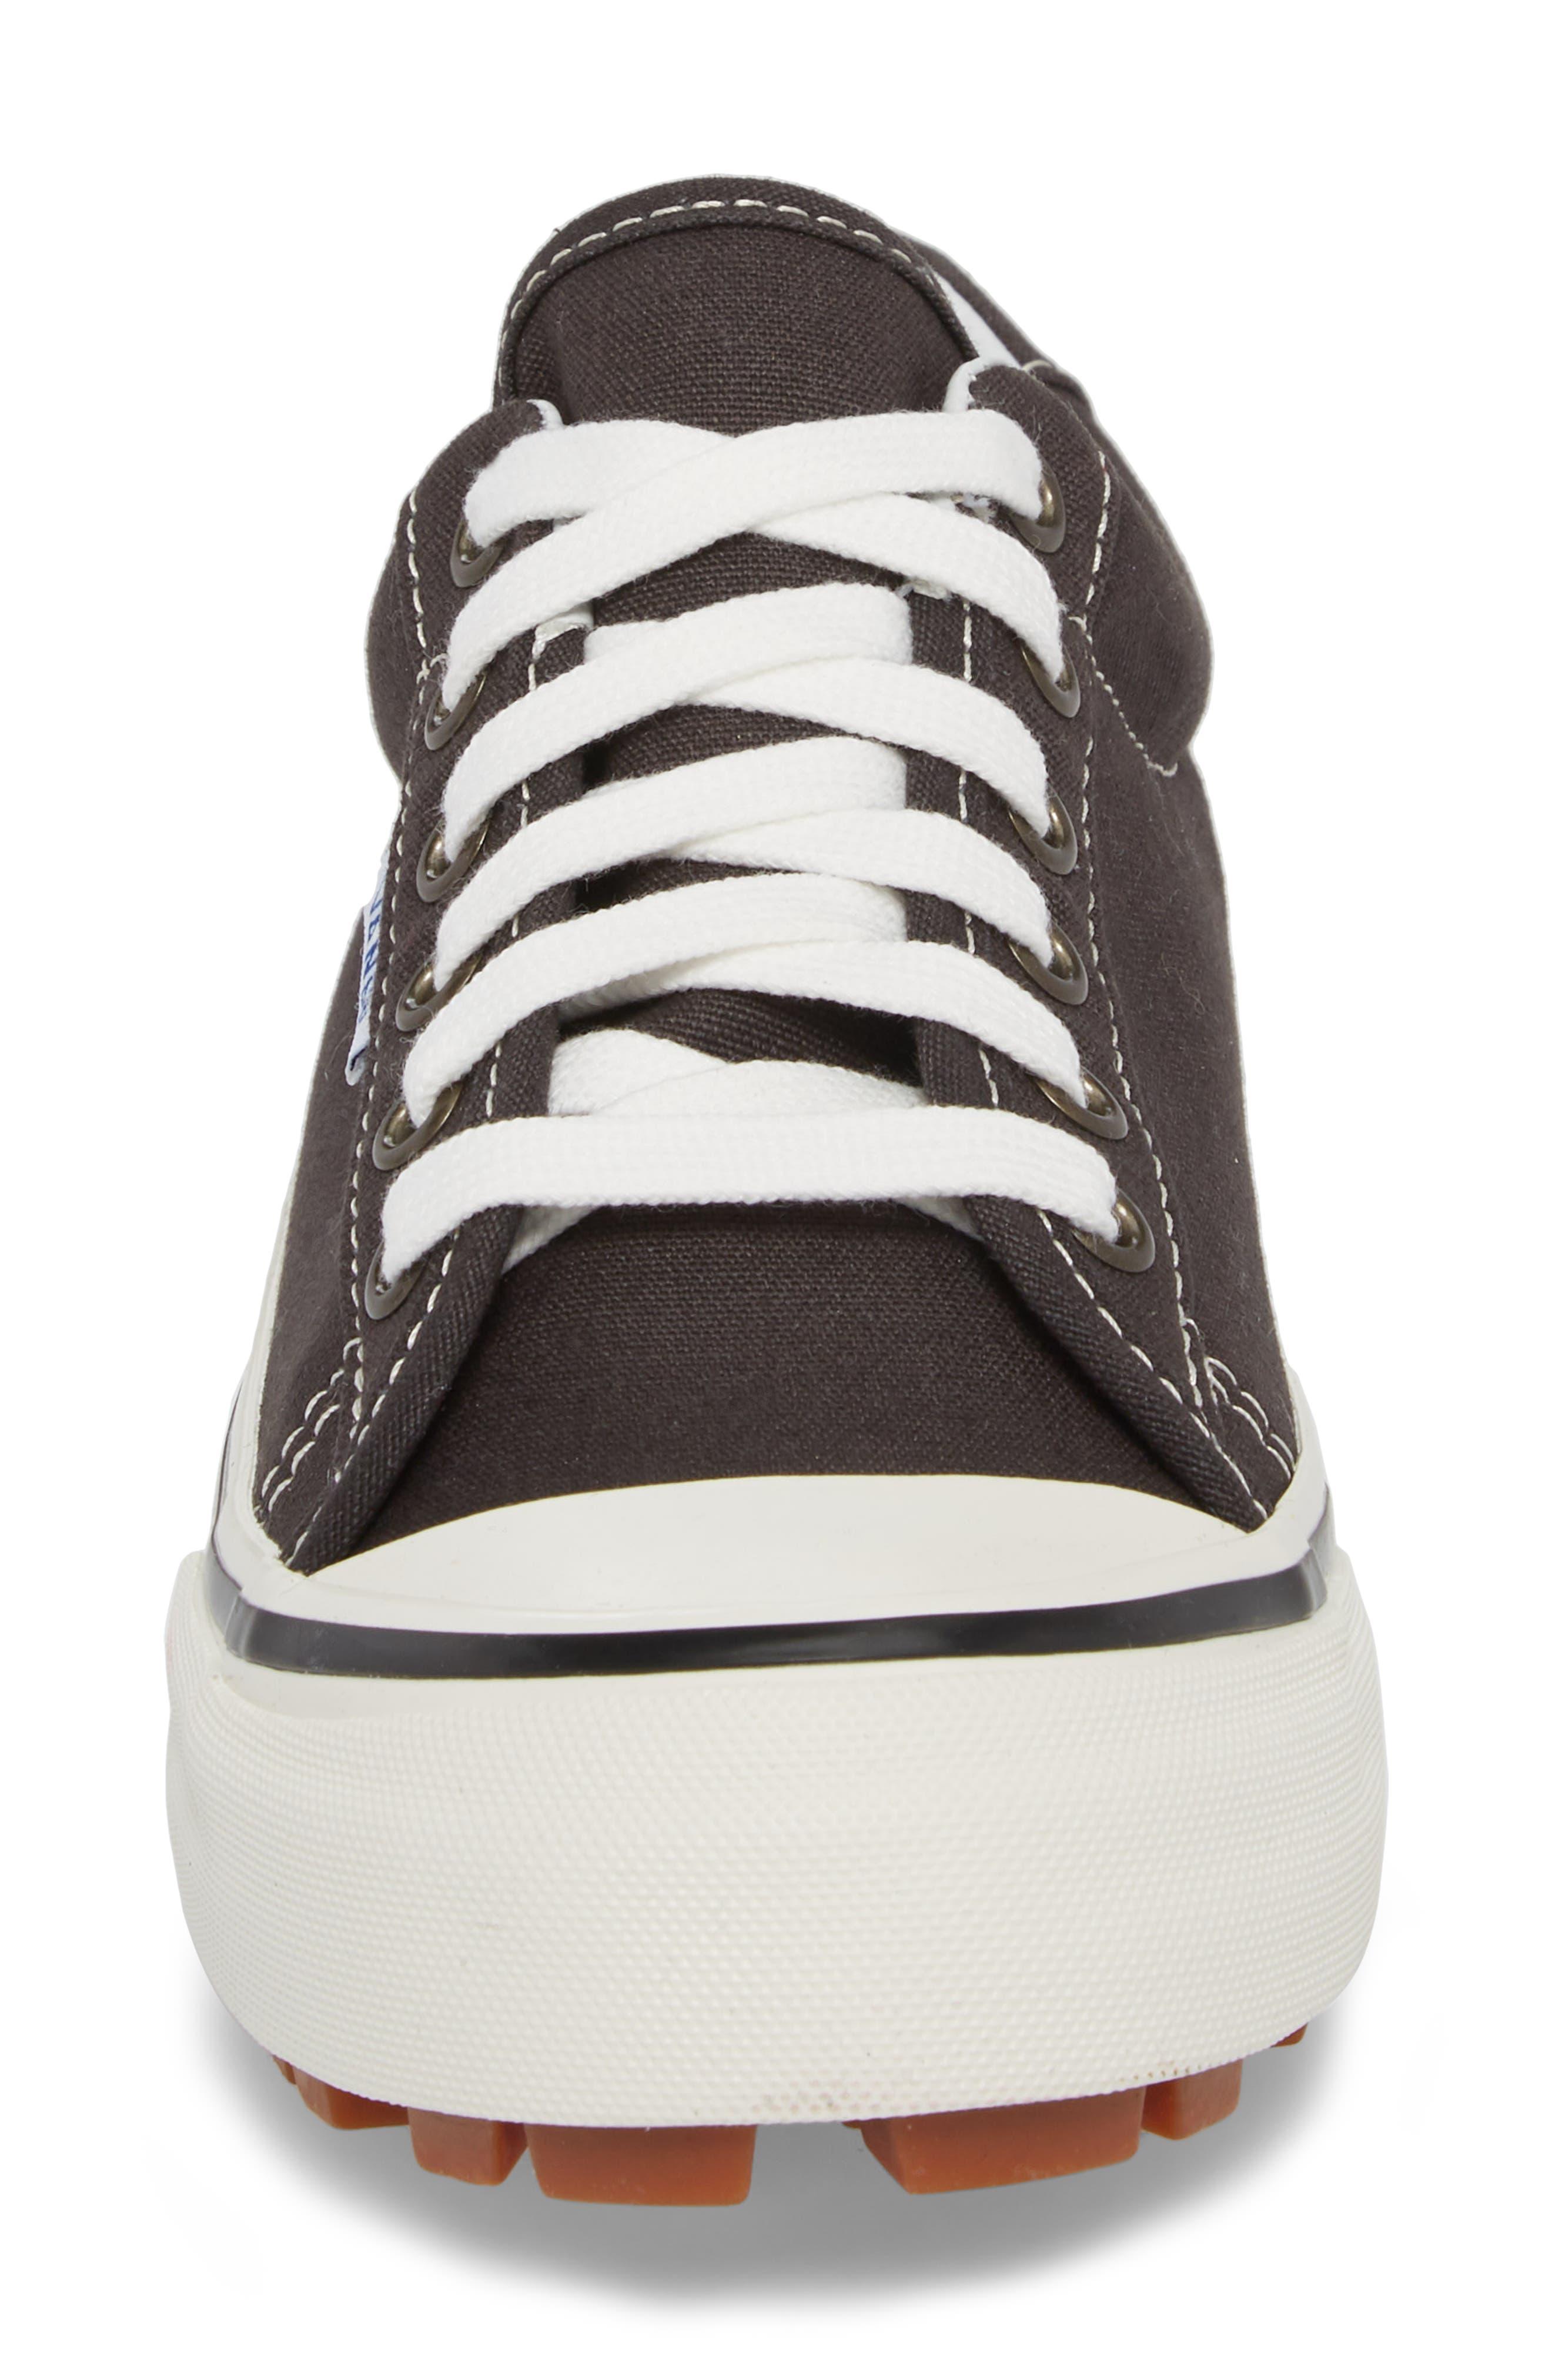 Anaheim Factory Style 29 DX Sneaker,                             Alternate thumbnail 4, color,                             001